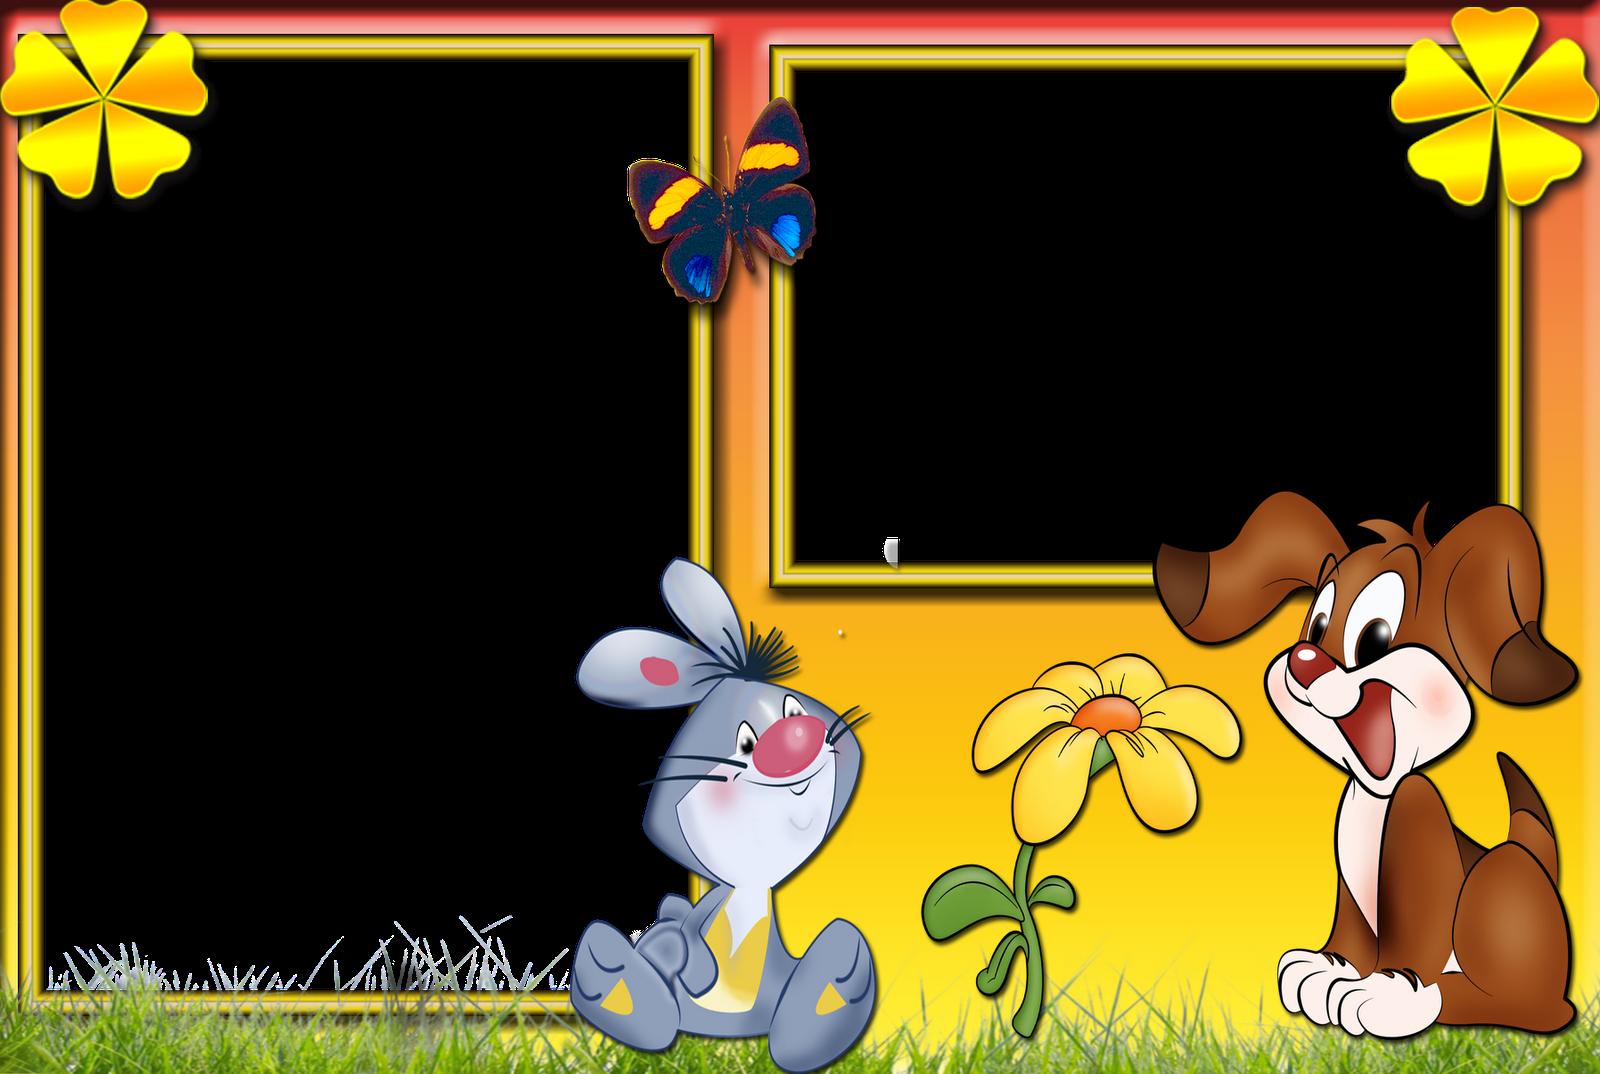 Wallpapers For Desktop Photoshop Frames wallpapers downloads 1600x1074